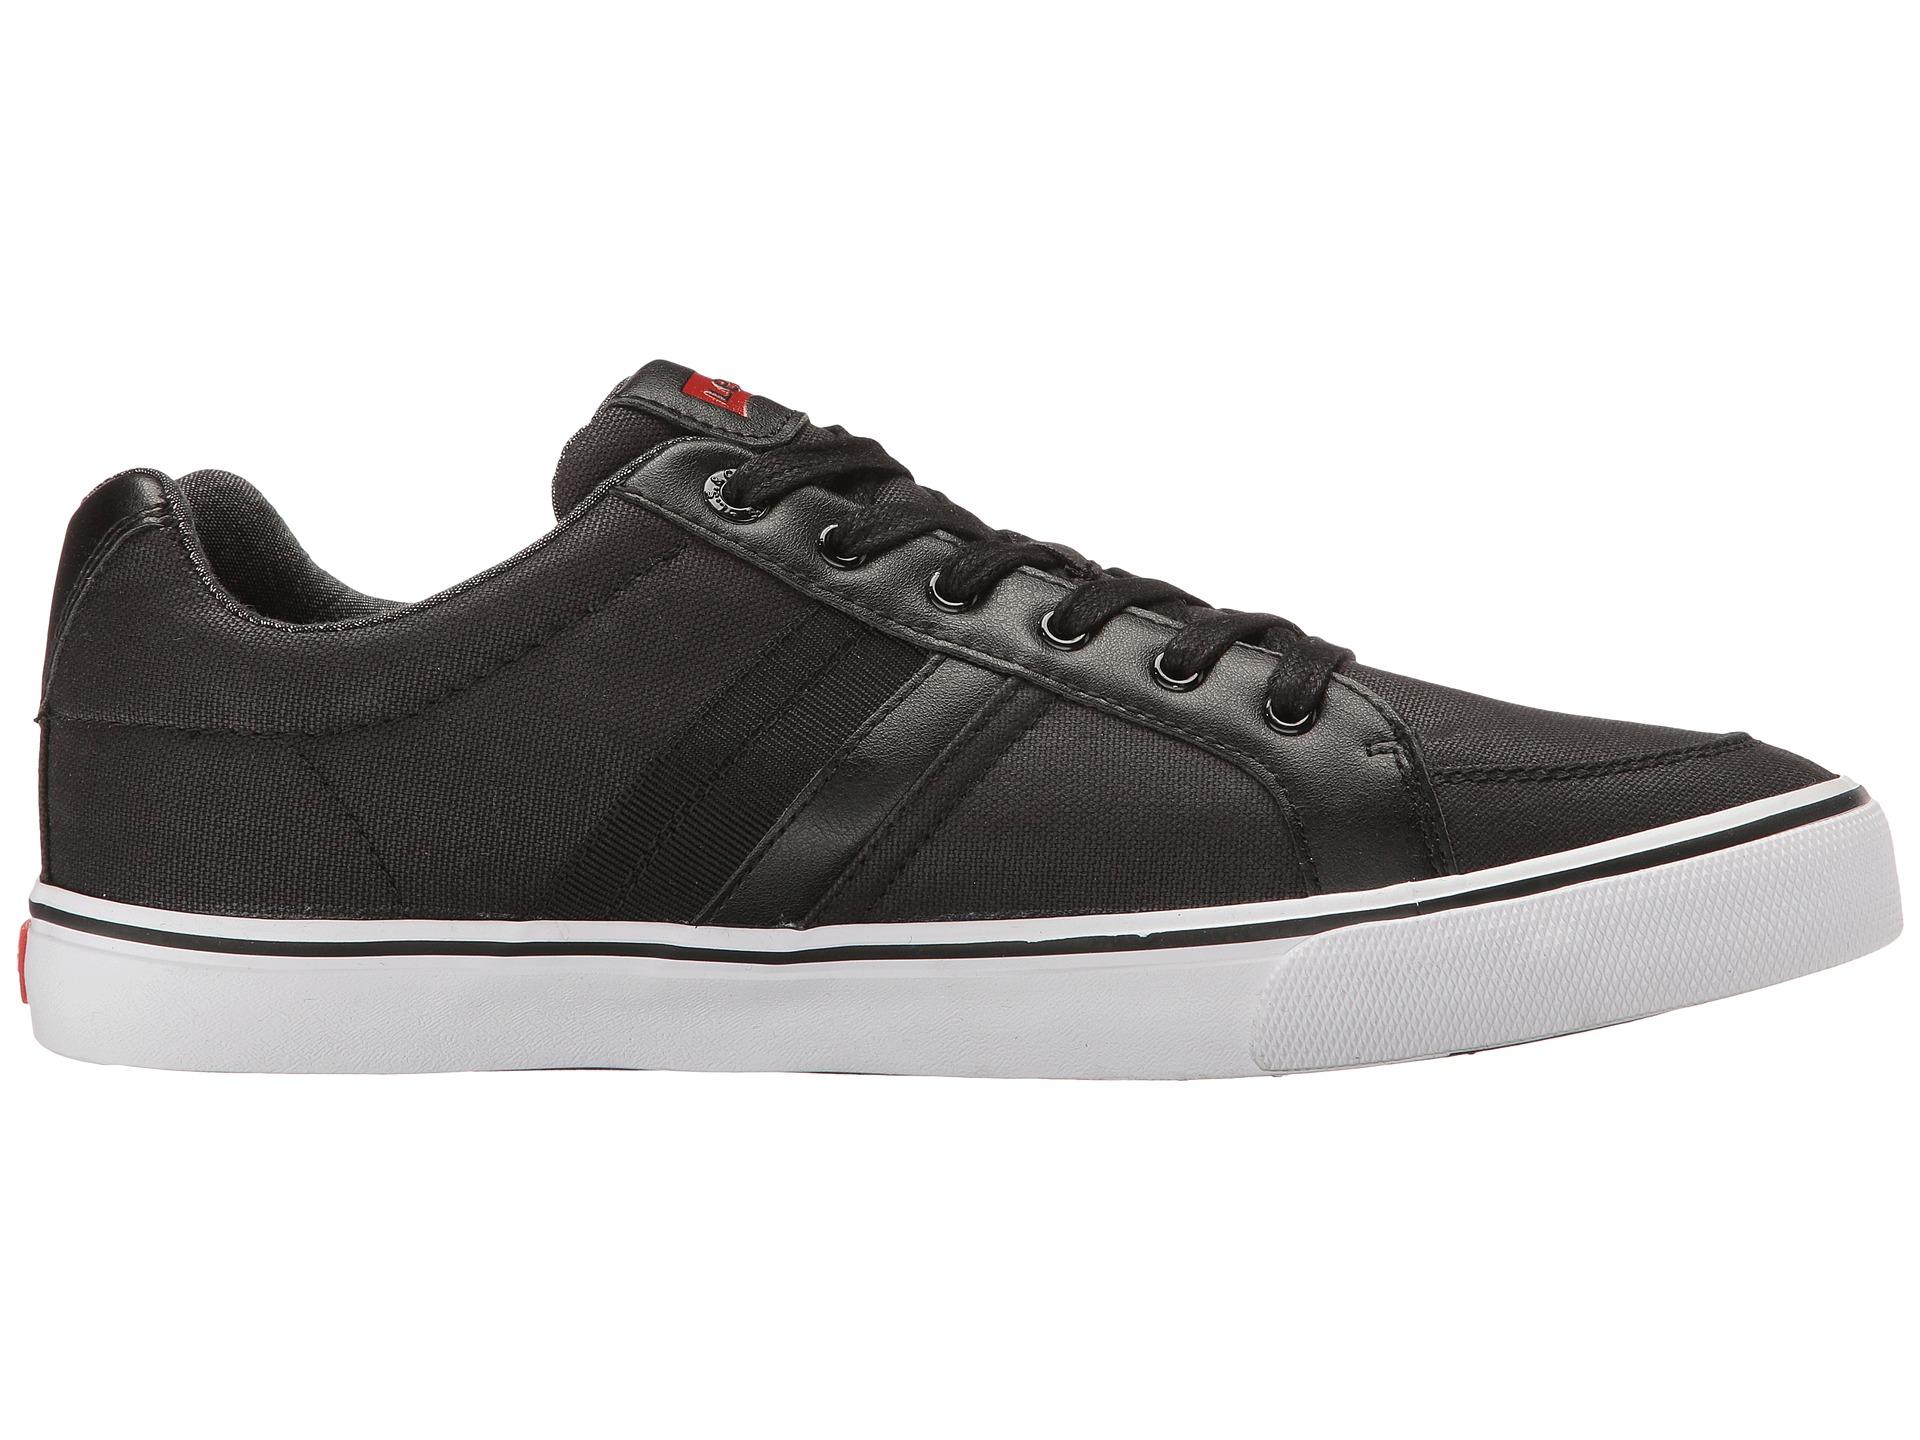 Buy Bowling Shoes Near Me